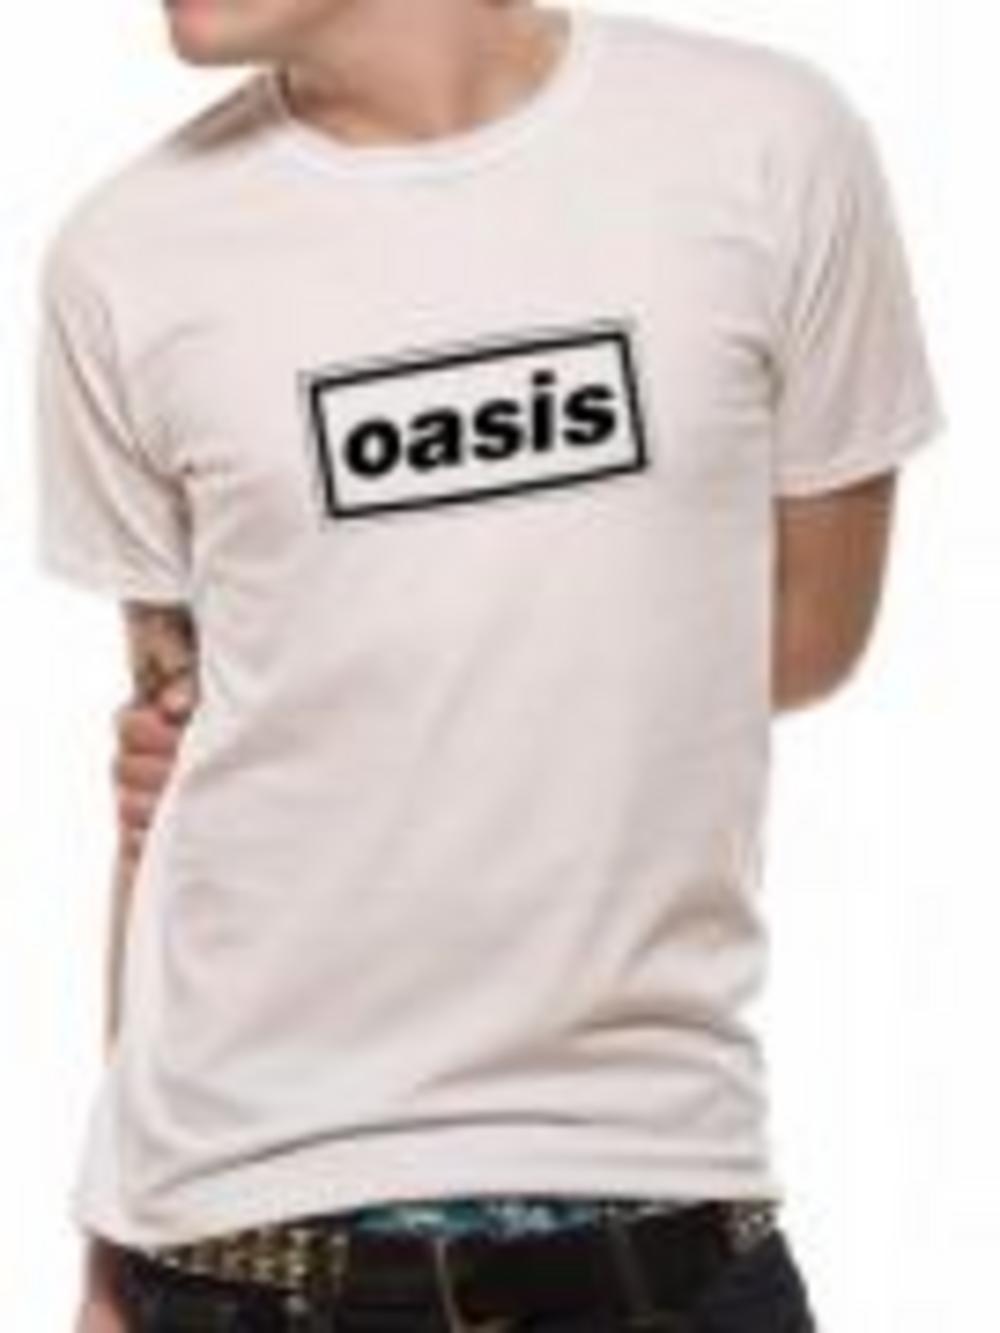 oasis logo t shirt buy oasis logo t shirt at the kerrang online store uk oasis store. Black Bedroom Furniture Sets. Home Design Ideas